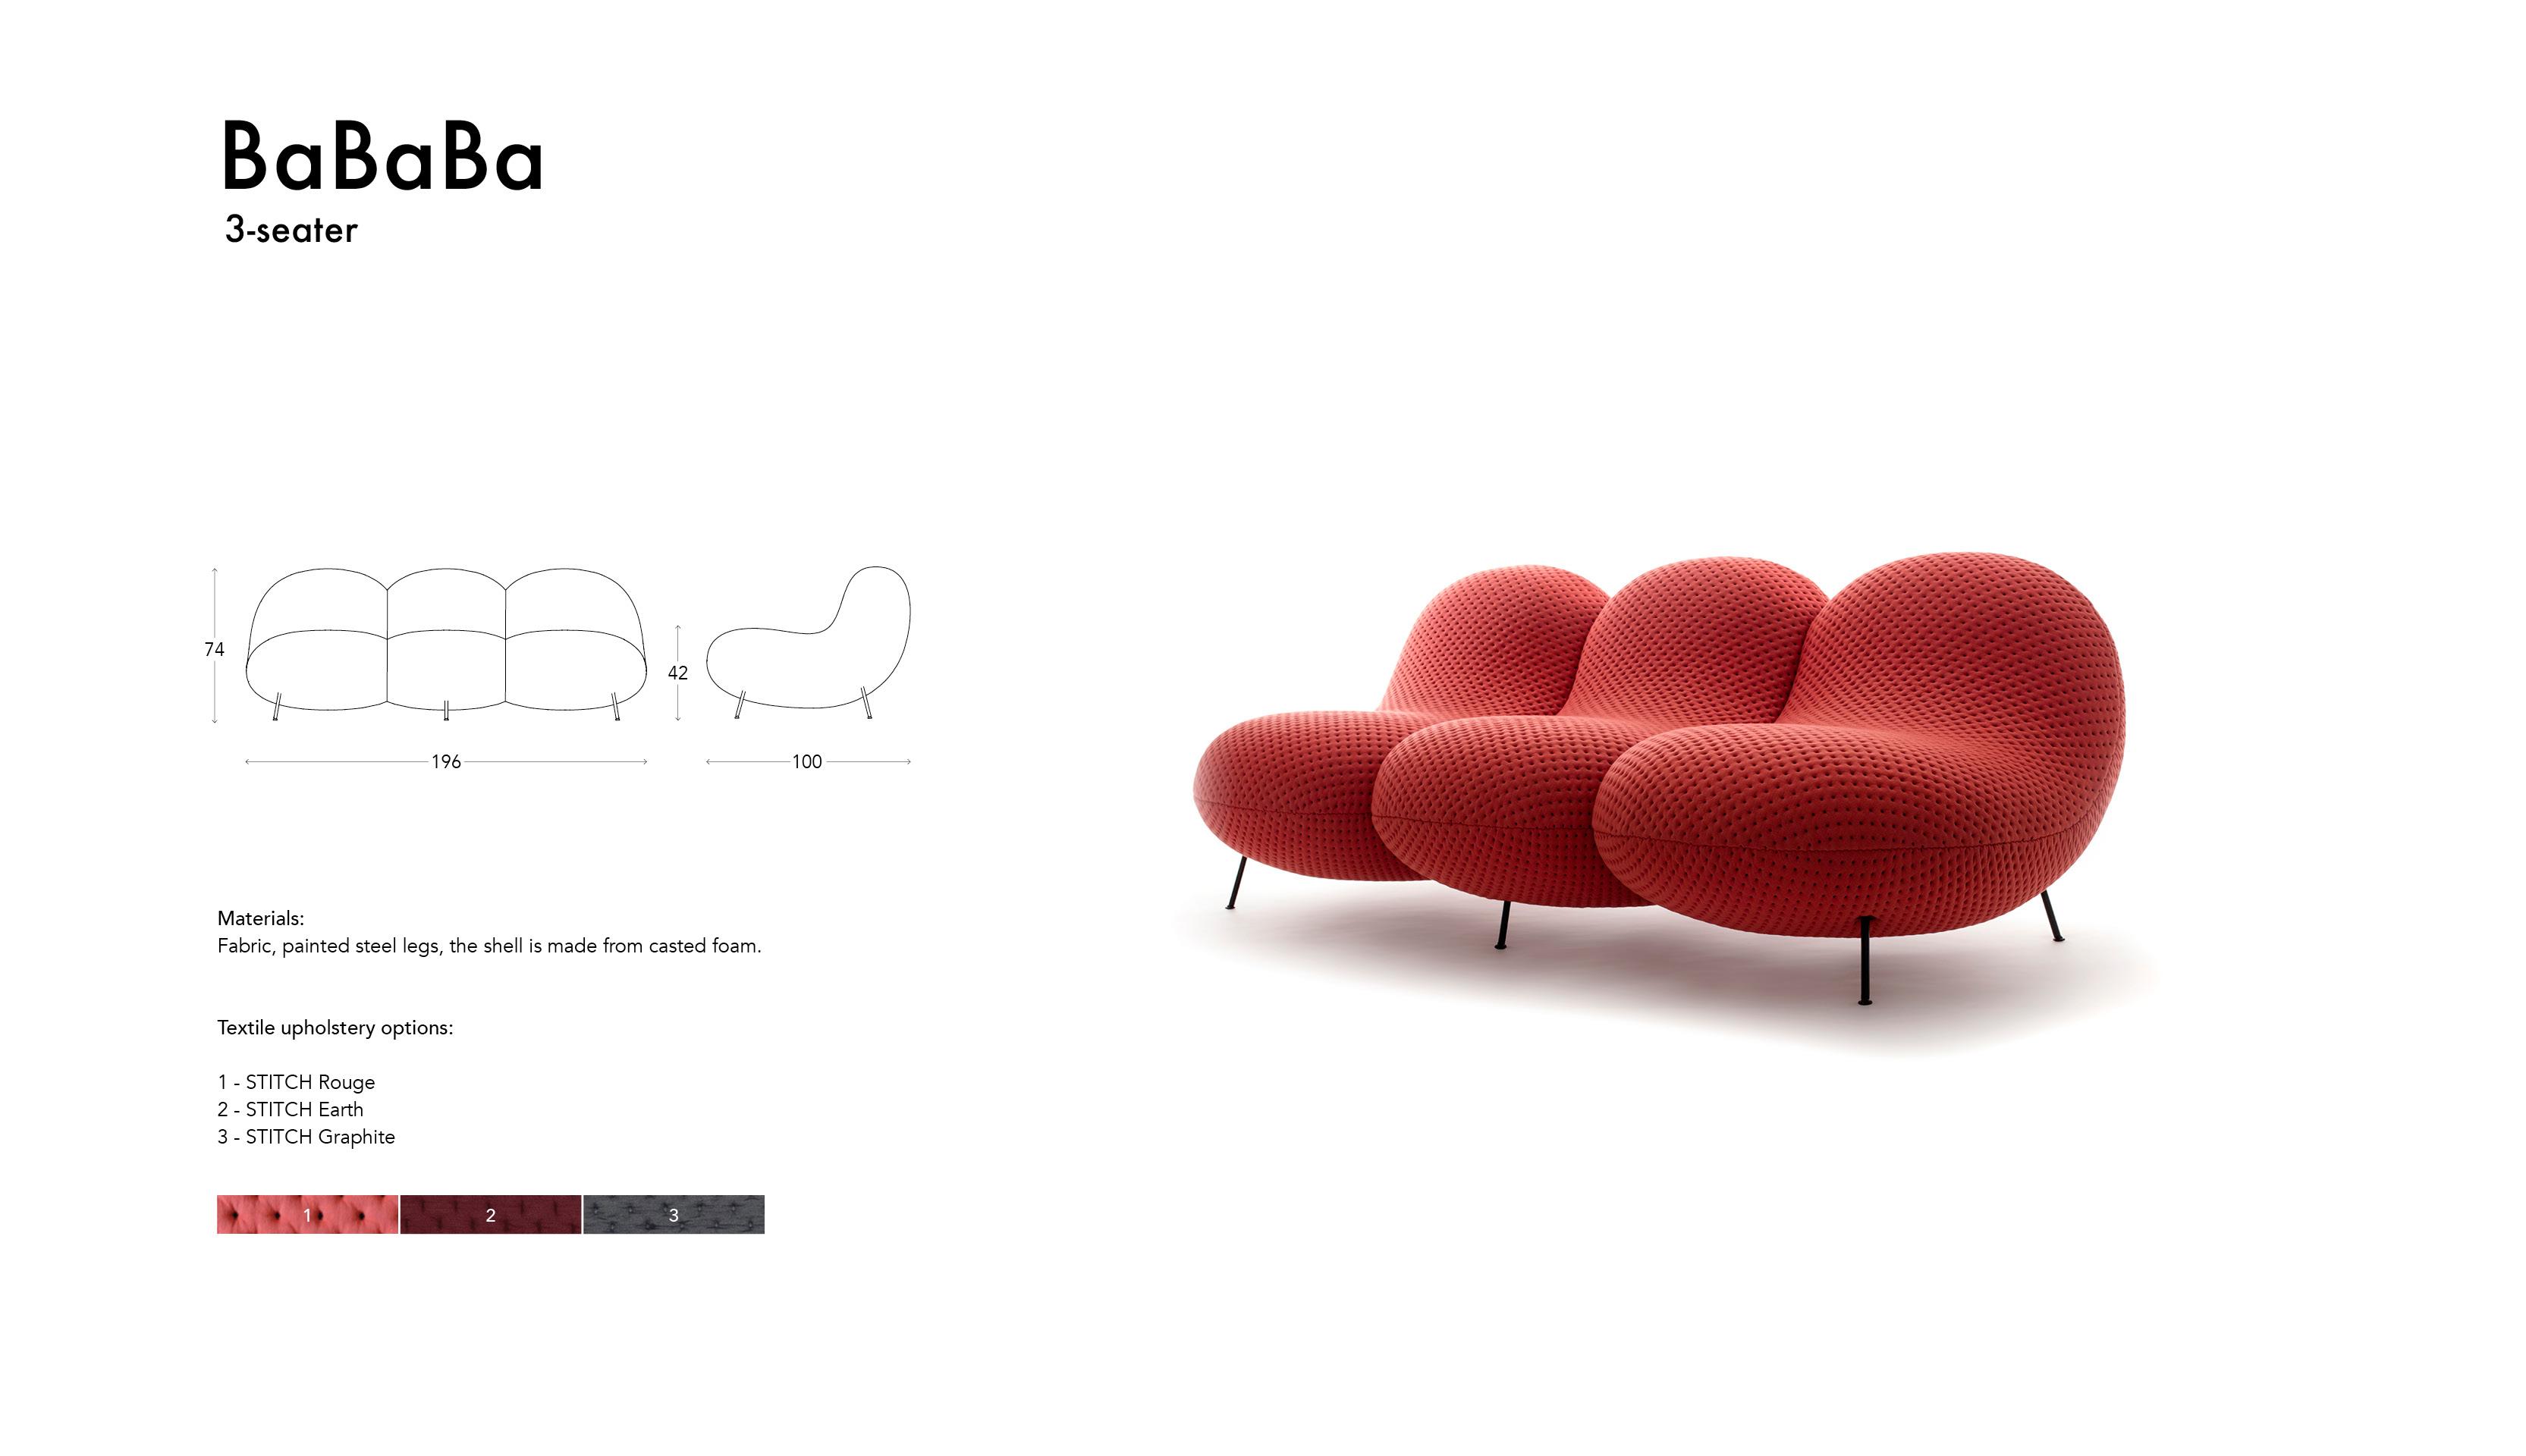 BaBaBa sofa2